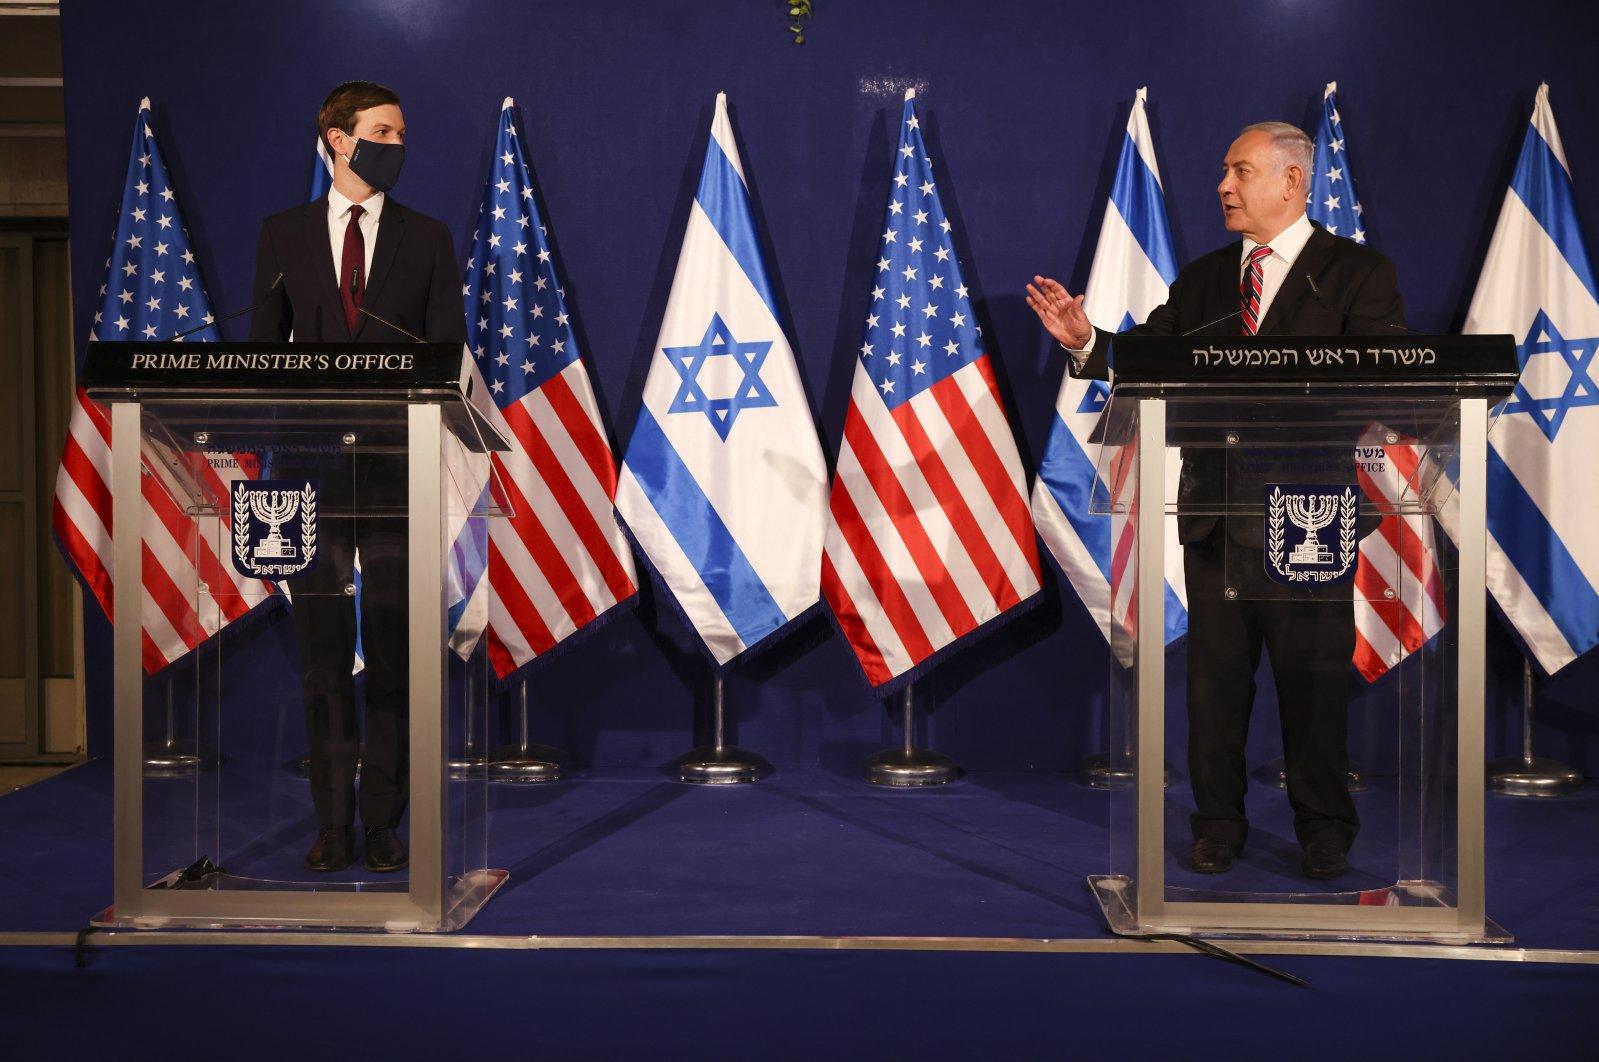 White House senior adviser Jared Kushner (L) and Israeli Prime Minister Benjamin Netanyahu during a news conference in Jerusalem, Dec. 21, 2020. (AP Photo)